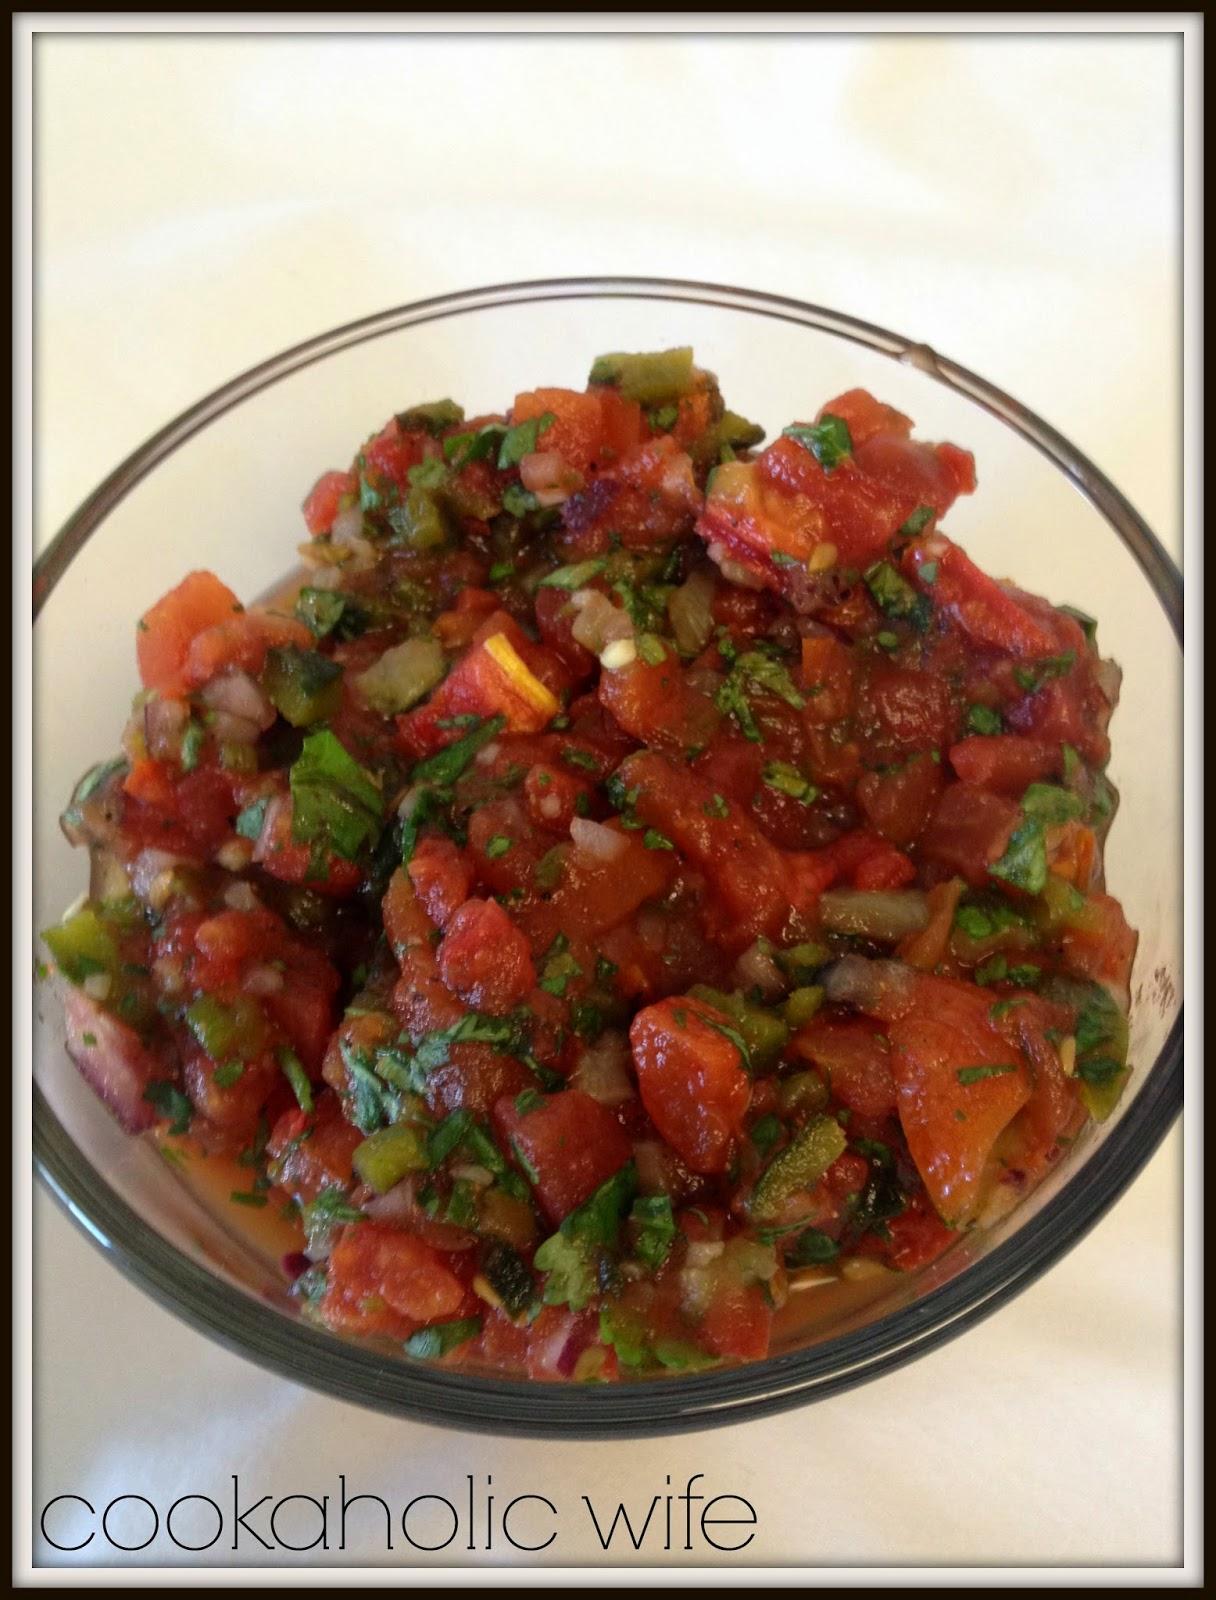 Cookaholic Wife: Roasted Tomato Salsa